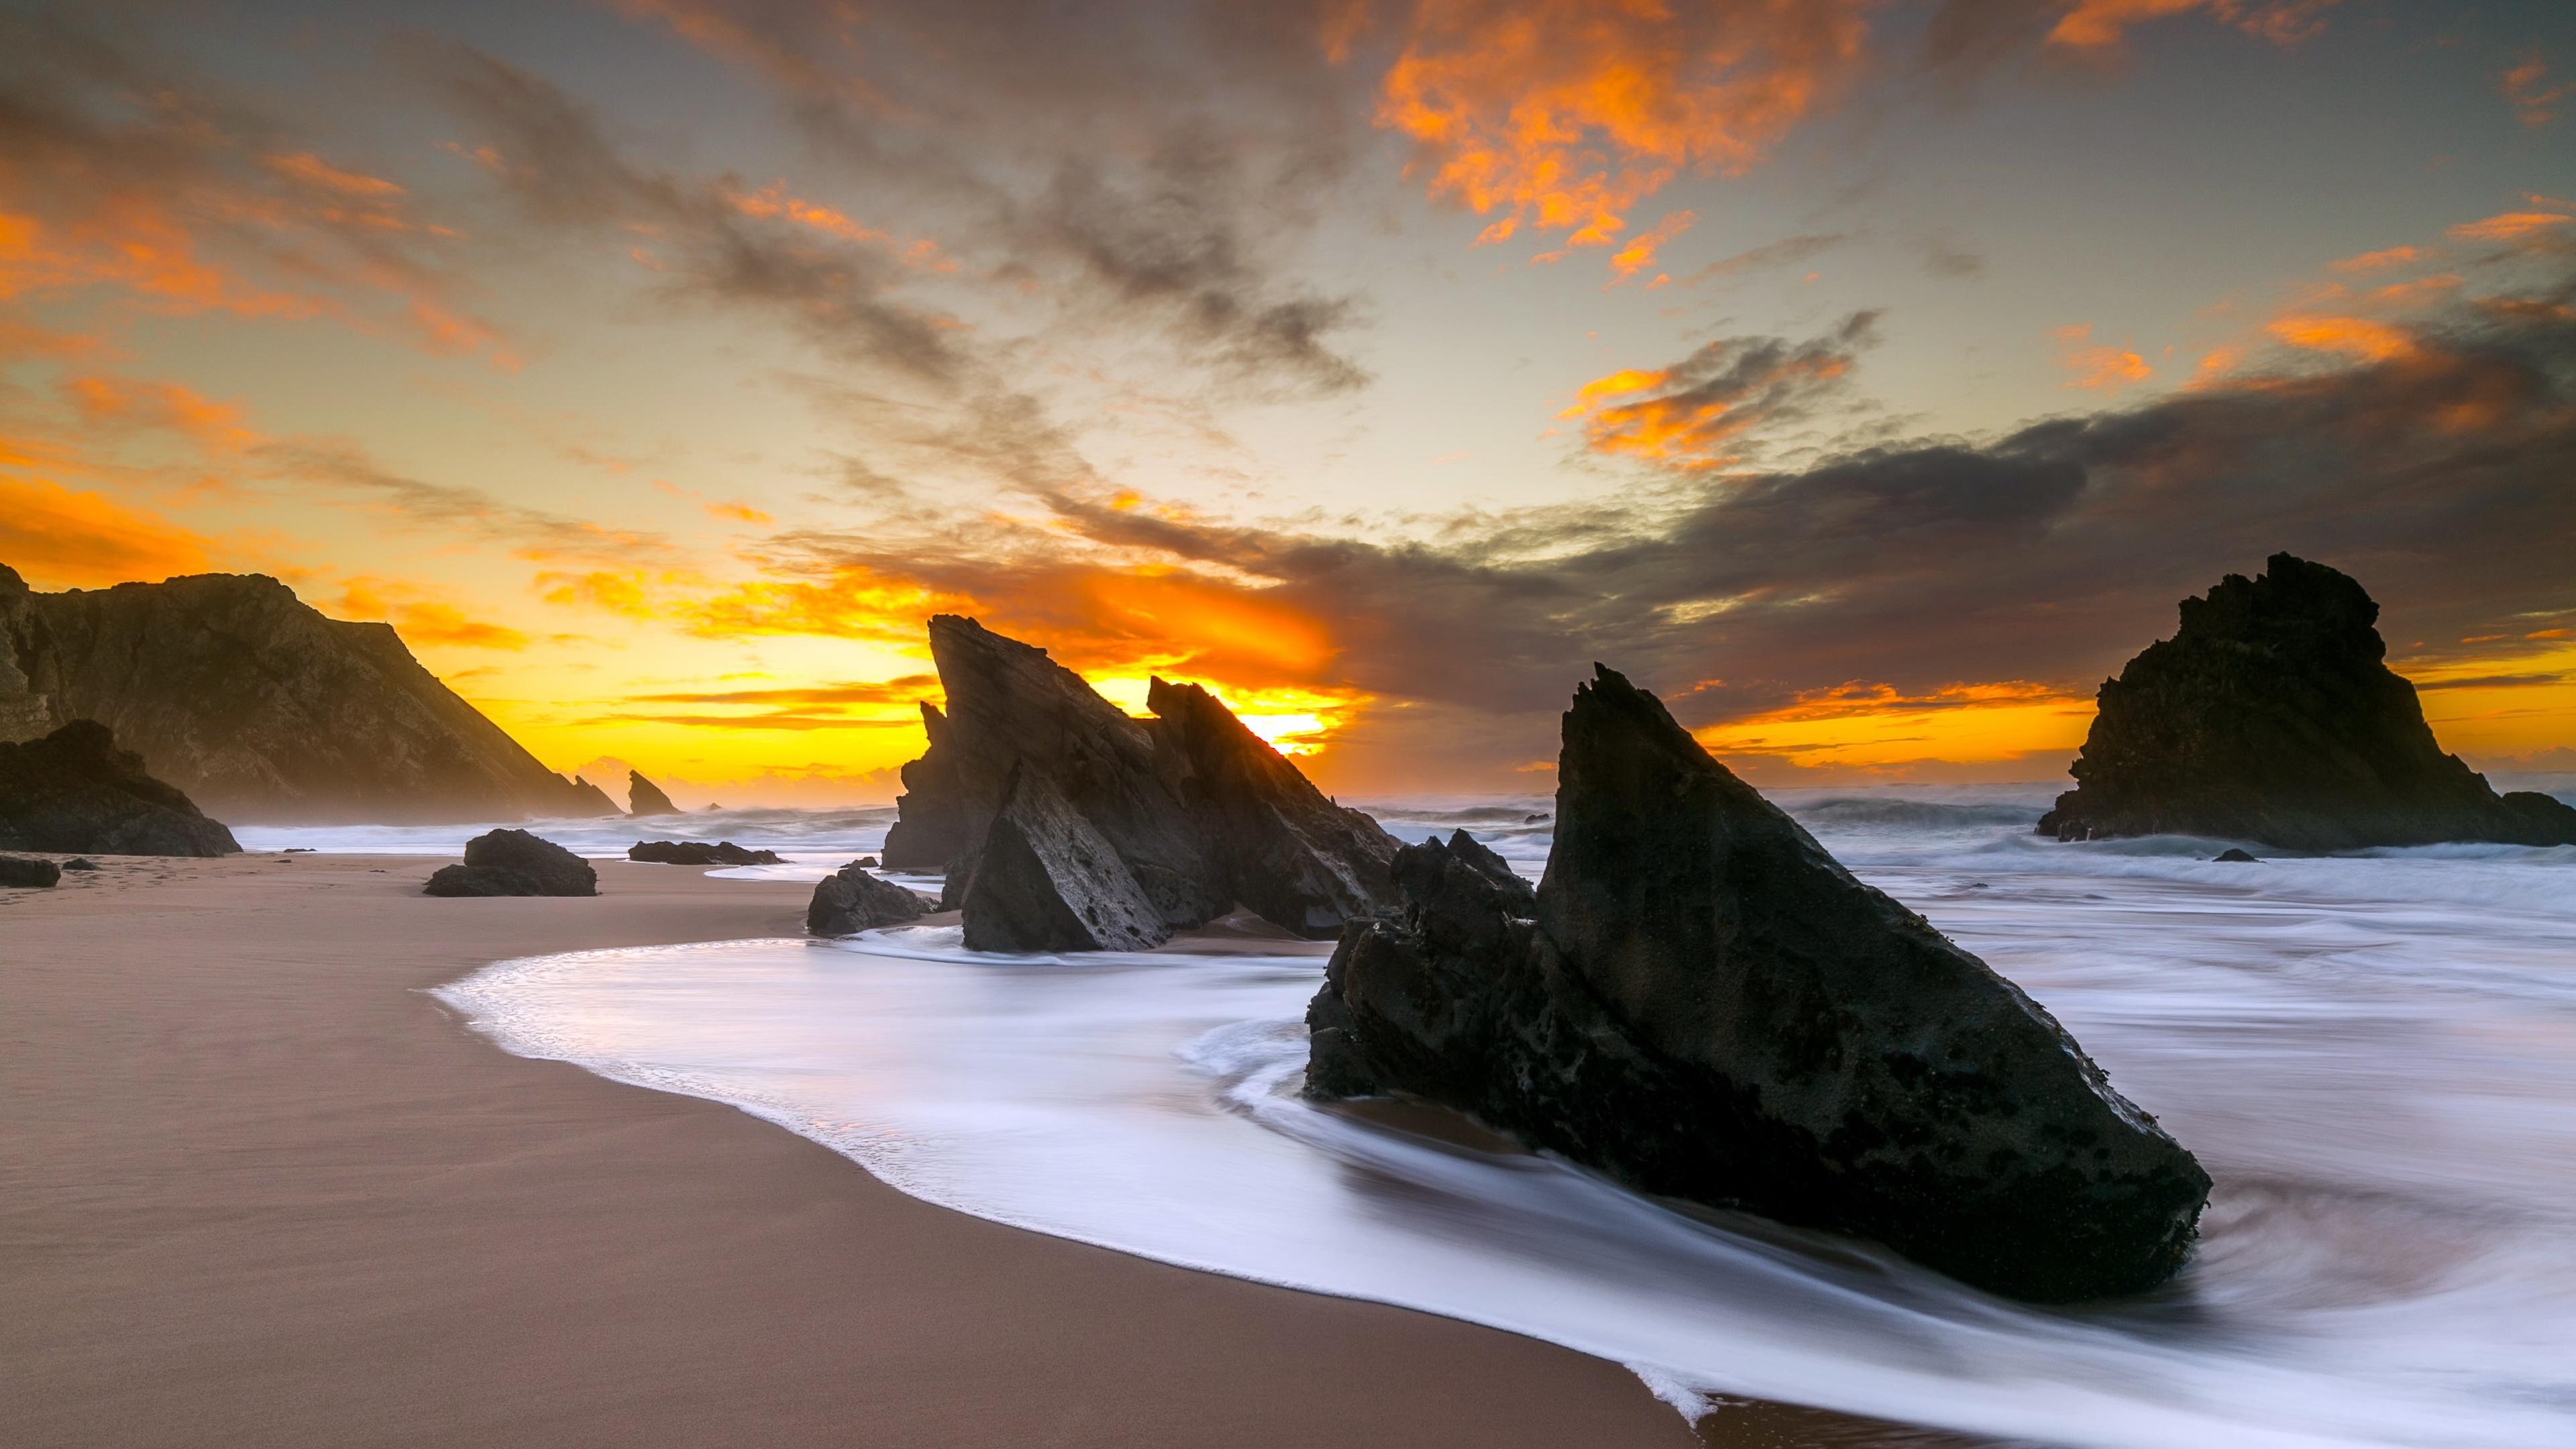 large rocks on beach shore 4k 1540136340 - Large Rocks On Beach Shore 4k - sunset wallpapers, sunrise wallpapers, shore wallpapers, rocks wallpapers, nature wallpapers, hd-wallpapers, dusk wallpapers, dawn wallpapers, beach wallpapers, 4k-wallpapers